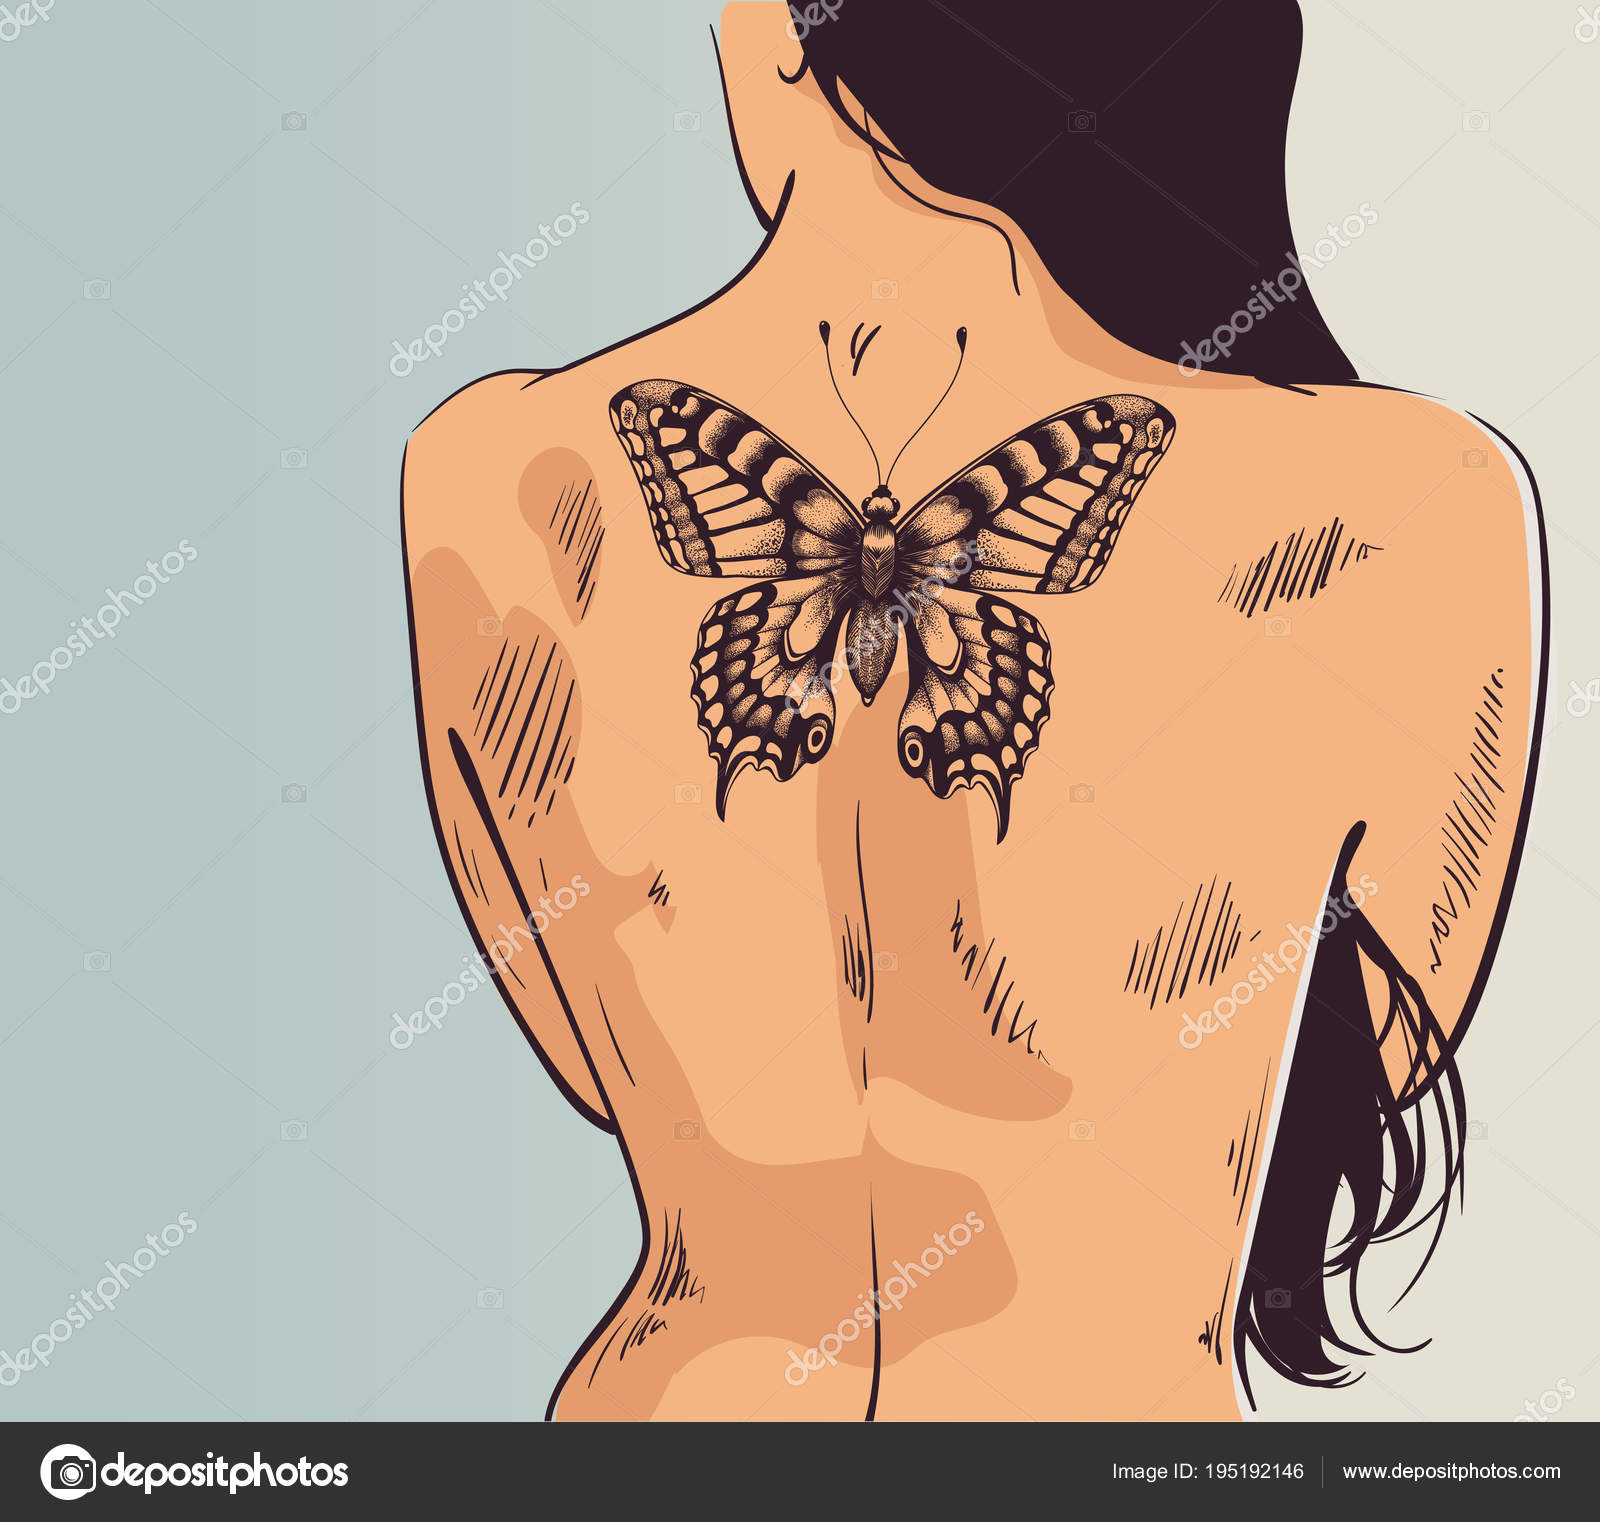 Chica Con Tatuaje Mujer De Vuelta Con La Espalda Tatuaje De